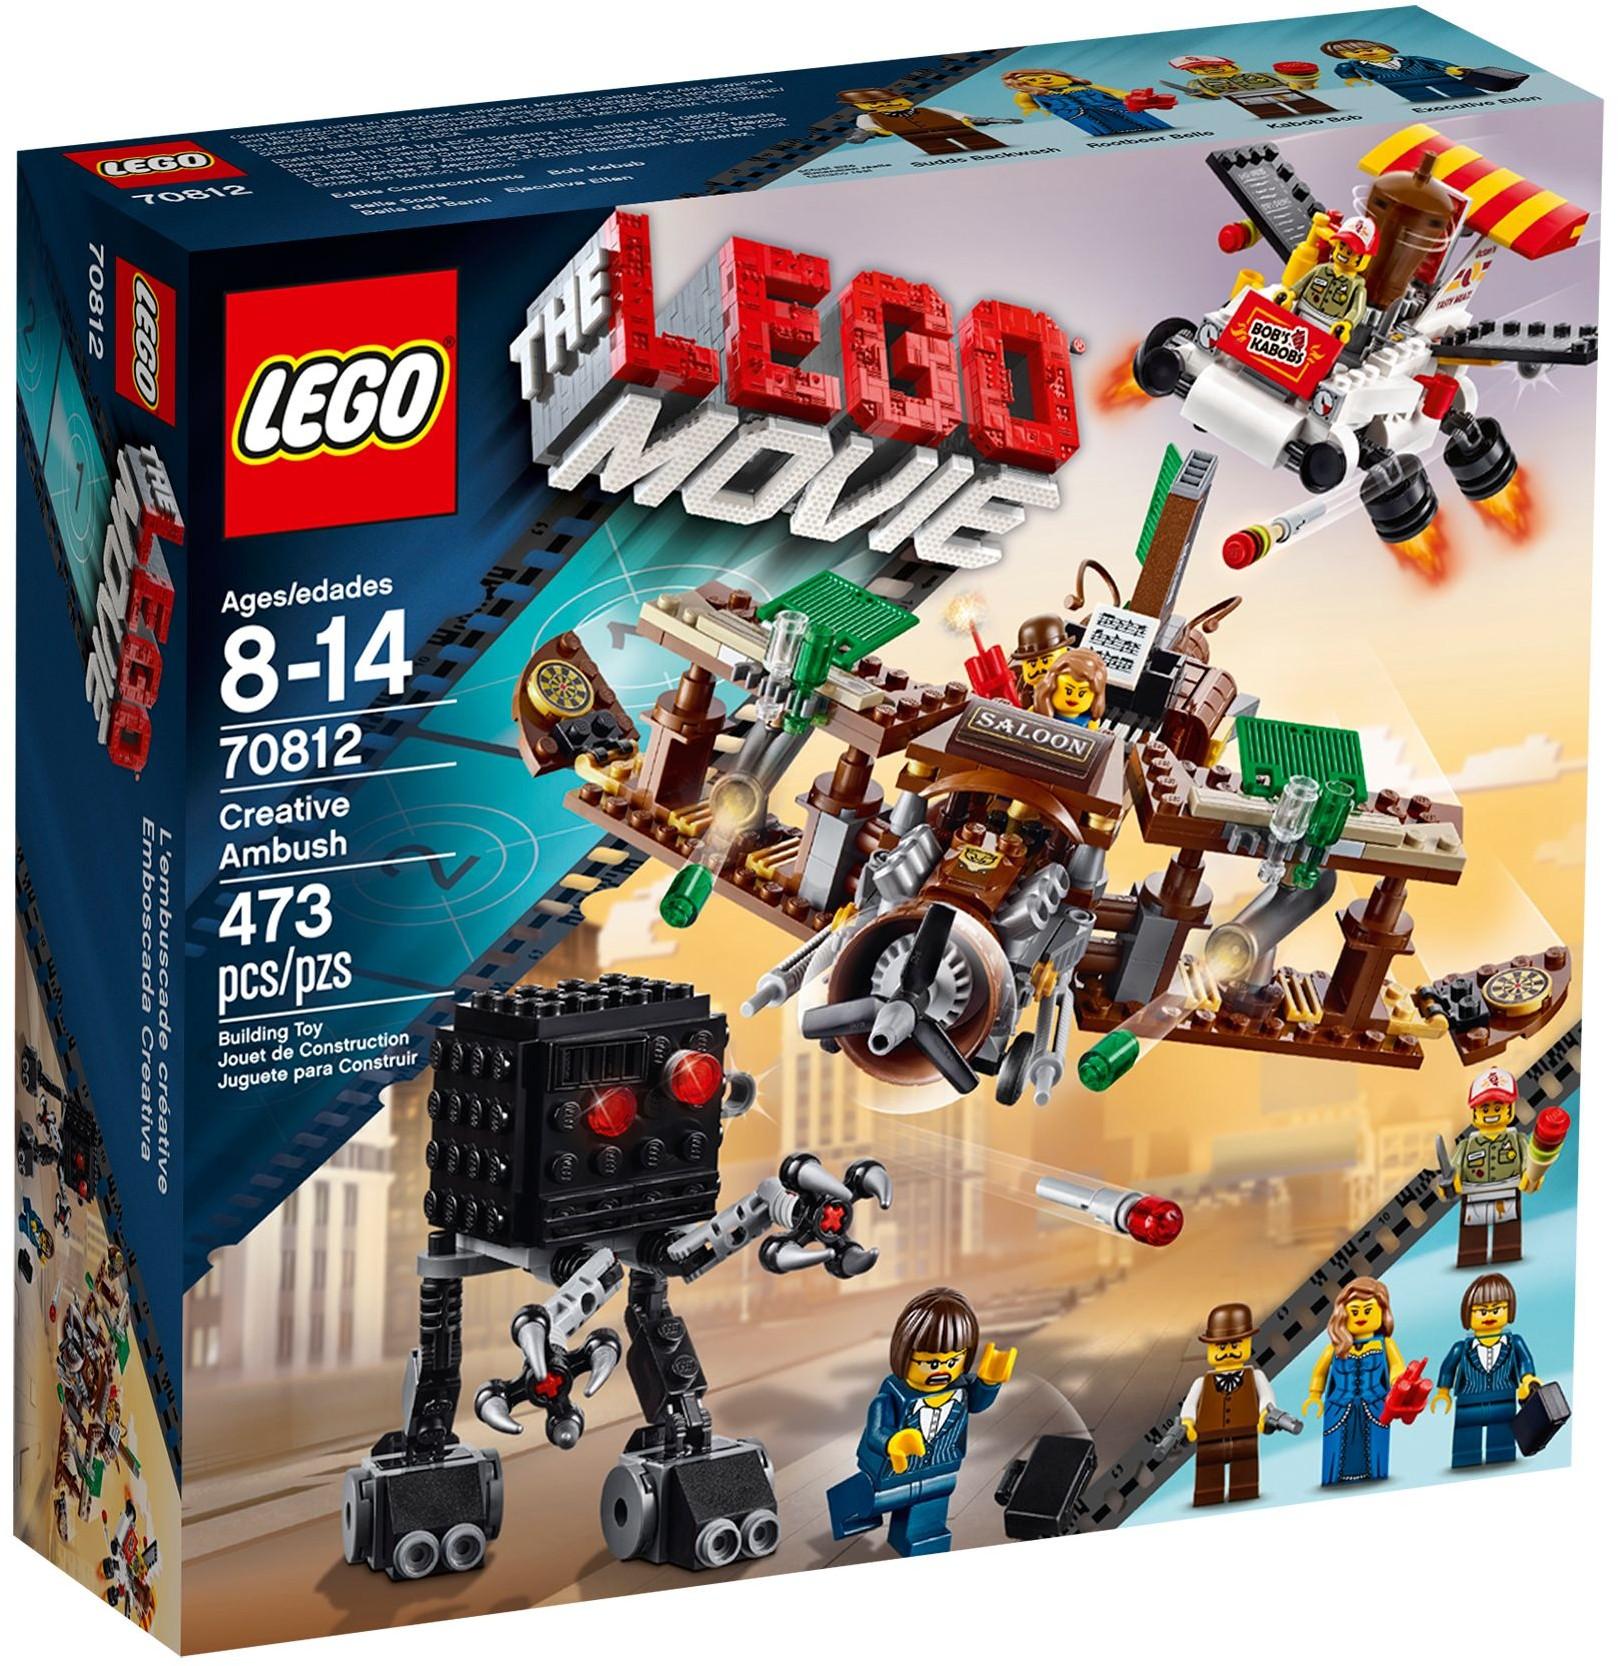 LEGO The LEGO Movie 70812 Creative Ambush review   Brickset